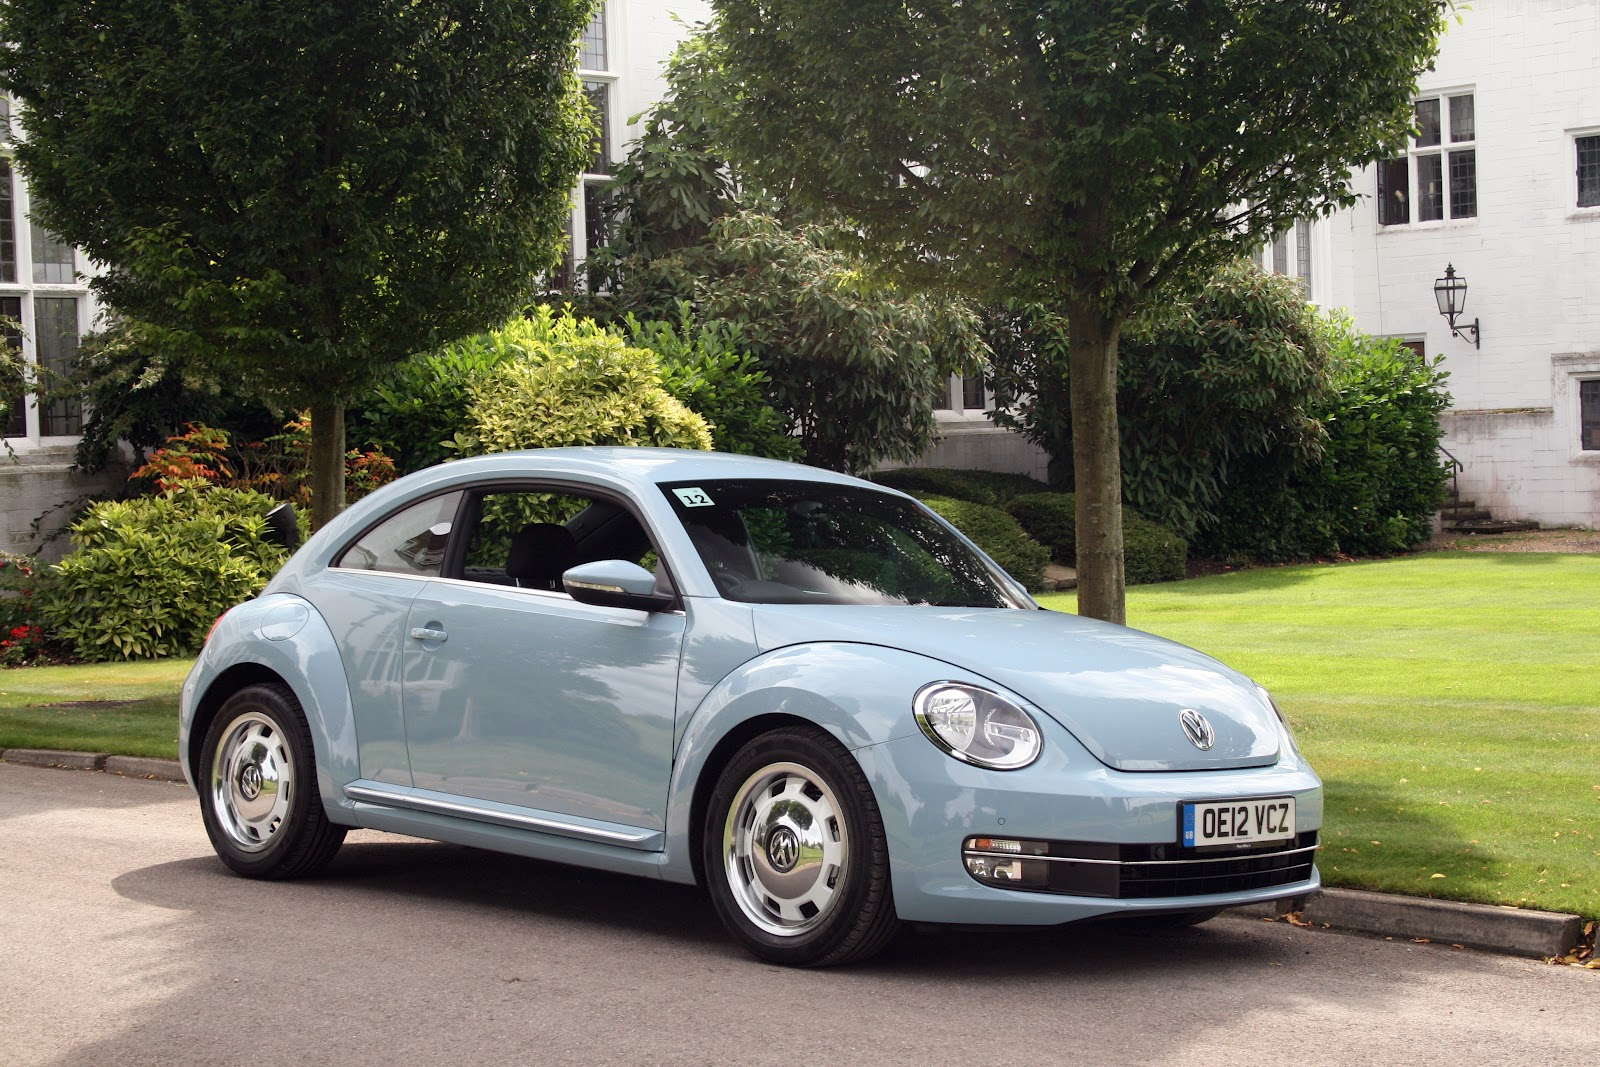 Vw Beetle Test >> Robmcsorleyoncars Vw Beetle Road Test